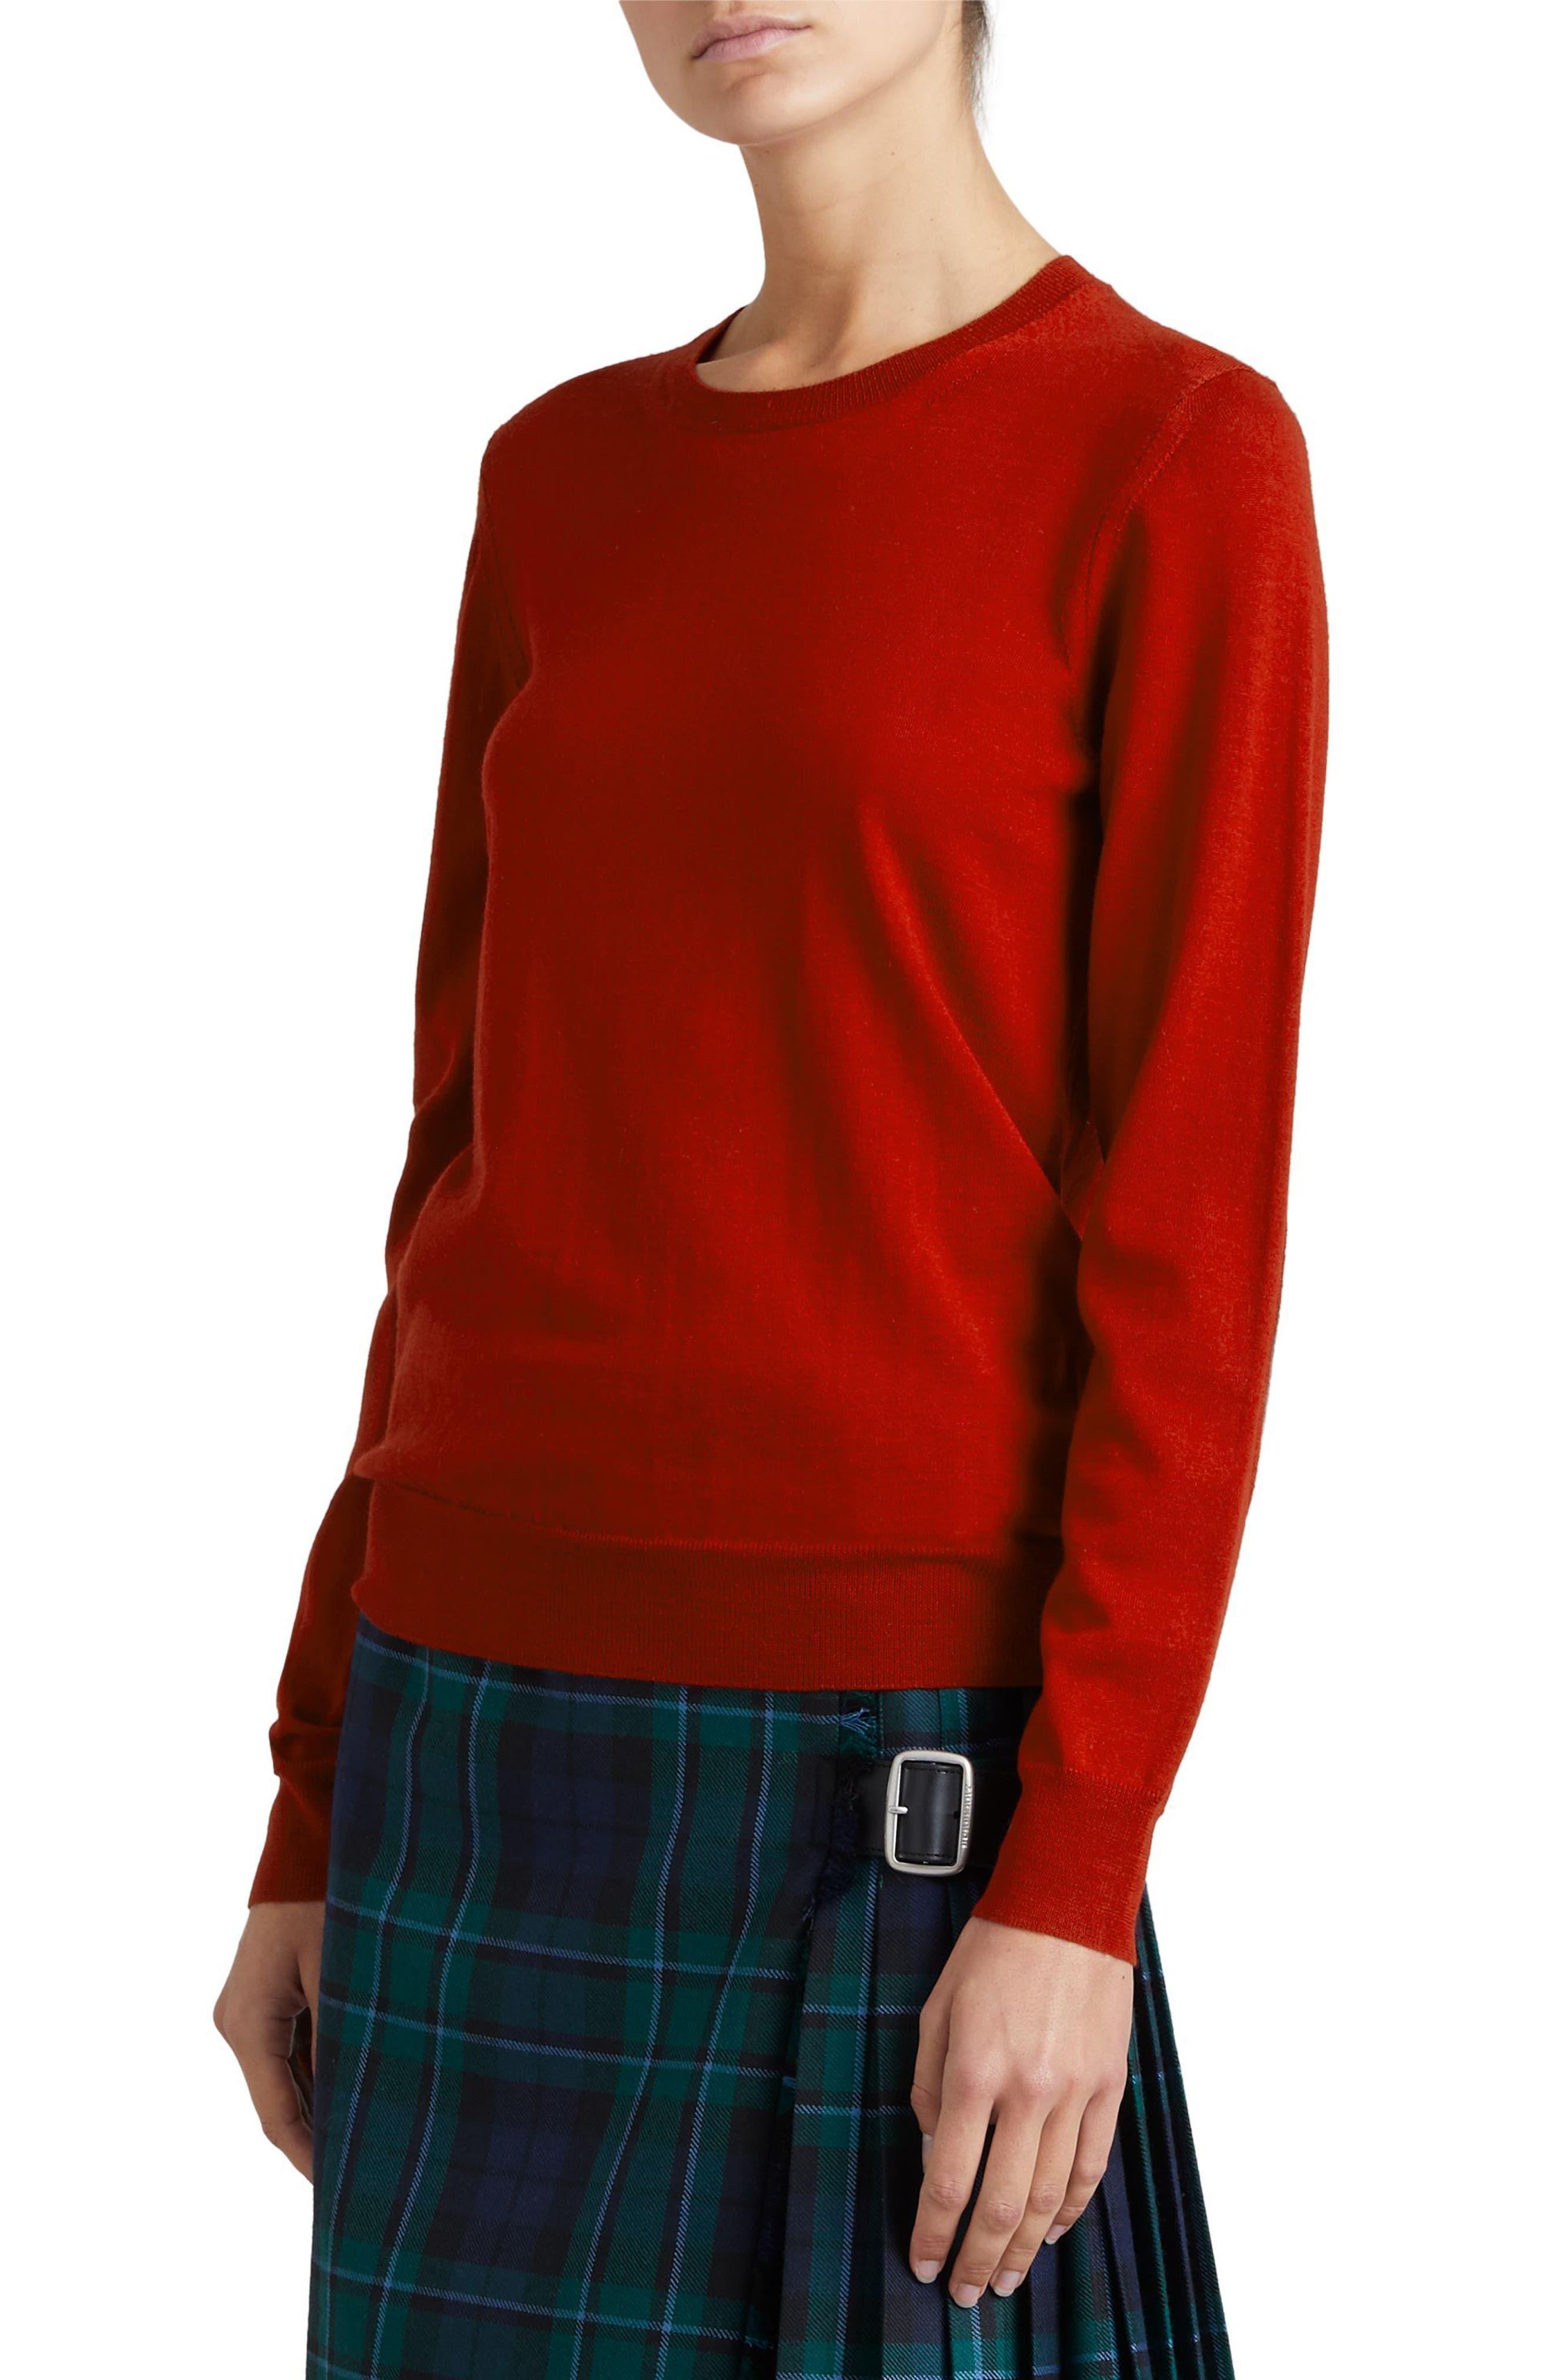 Viar Merino Wool Sweater,                             Main thumbnail 5, color,